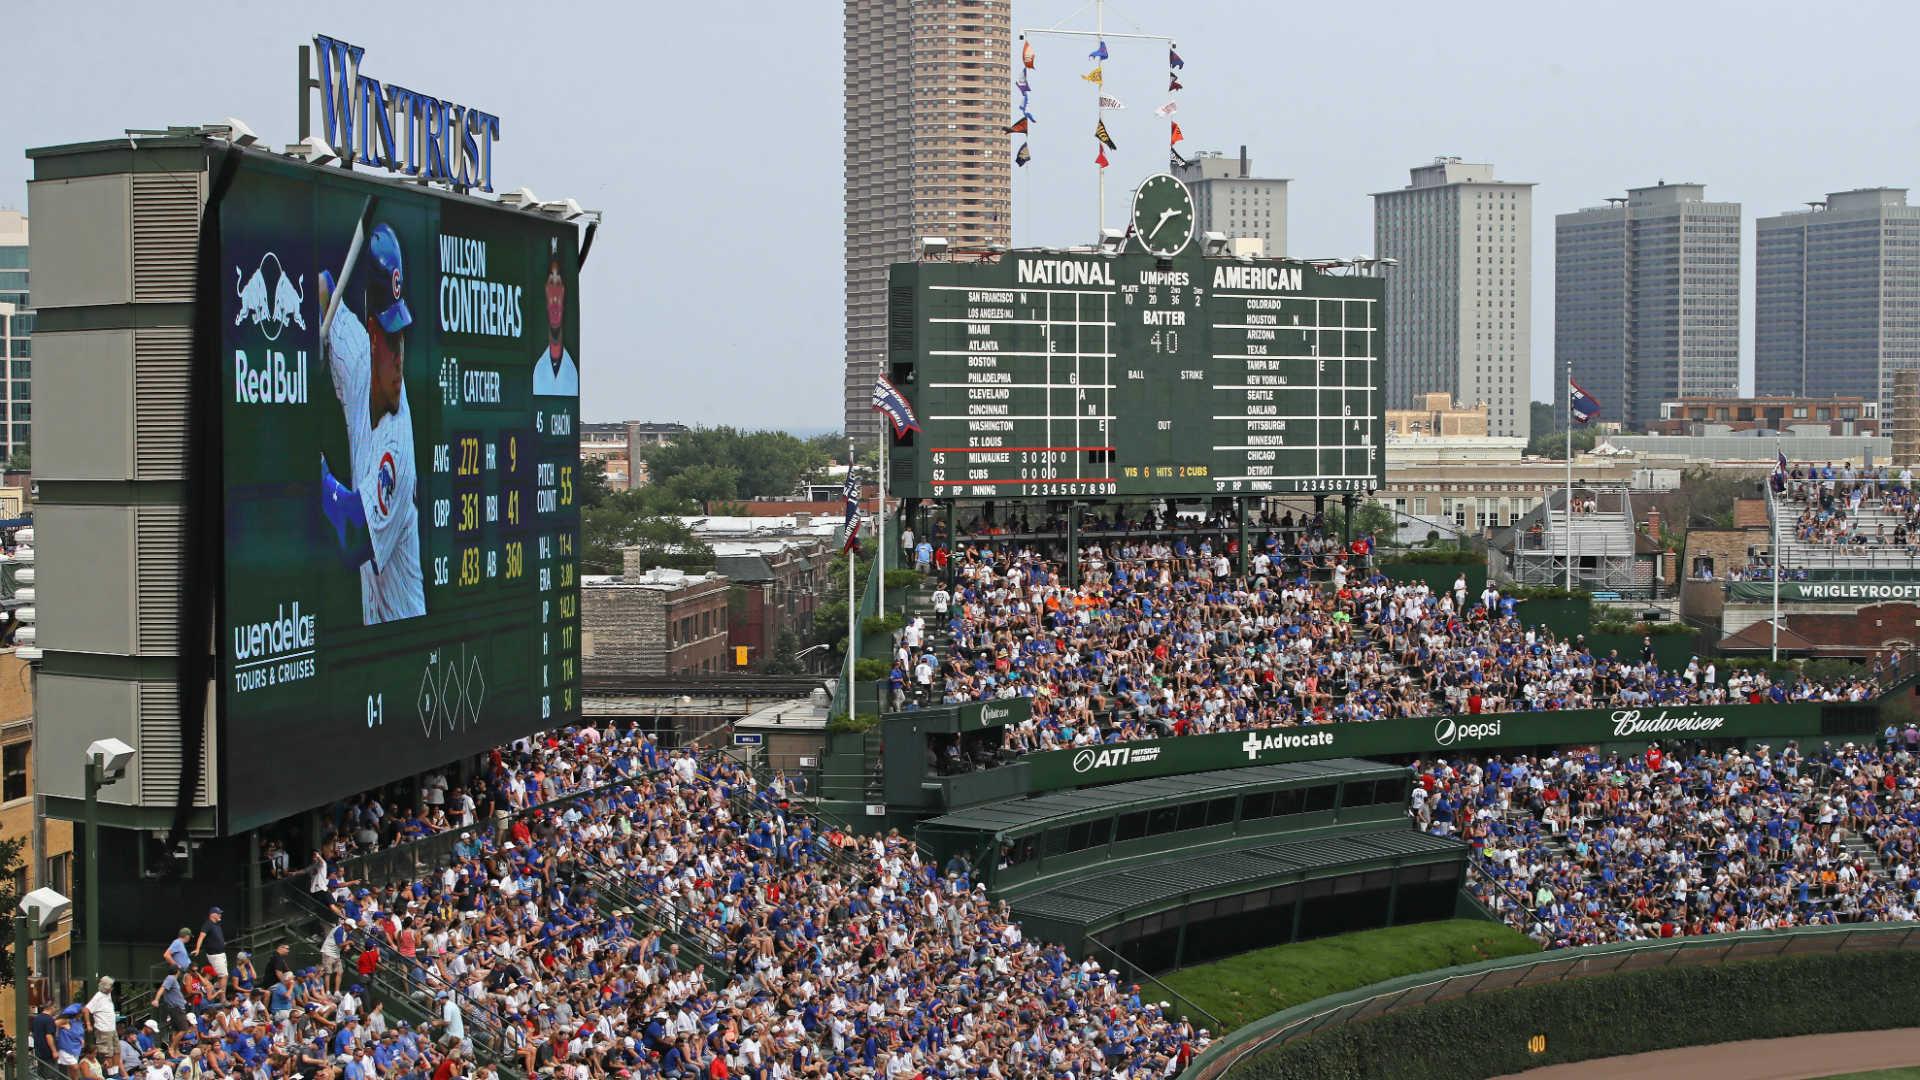 Cubs consider Wrigley sportsbook